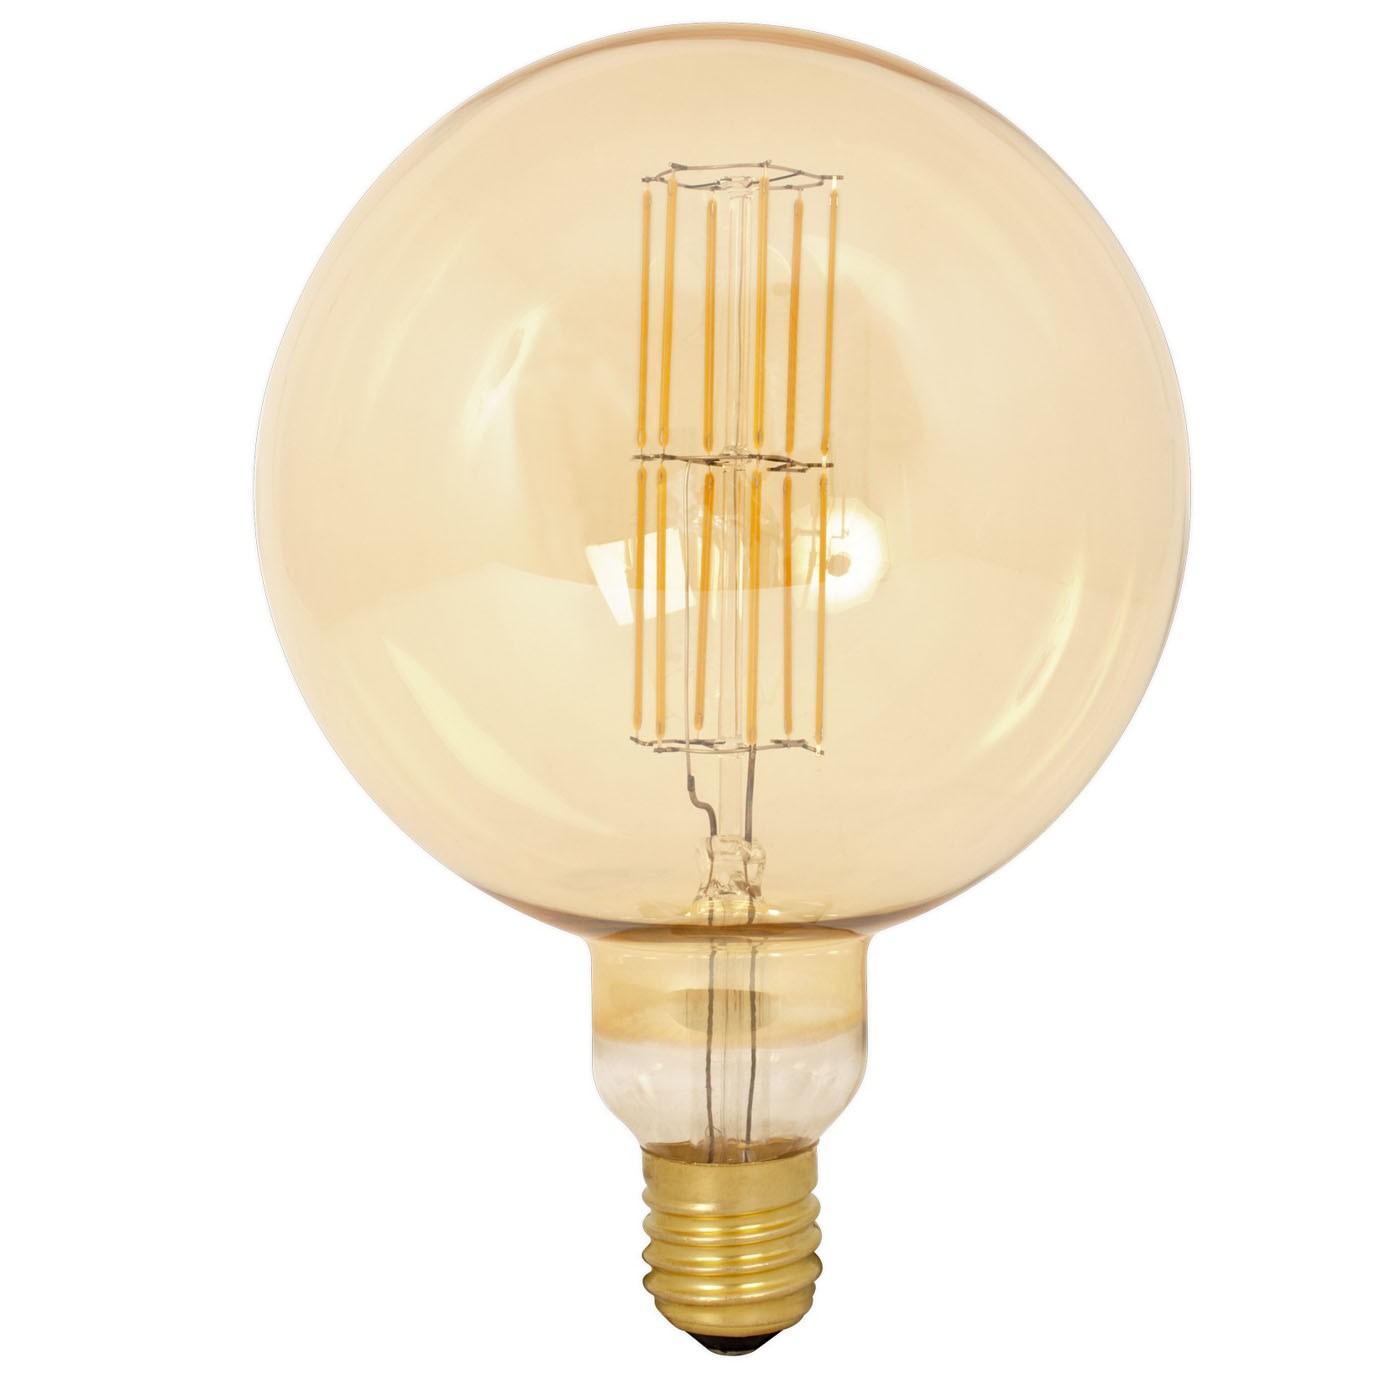 LED-lamppu Calex XXL LED Megaglobe E40 Ø 20x29 cm kulta - Taloon.com